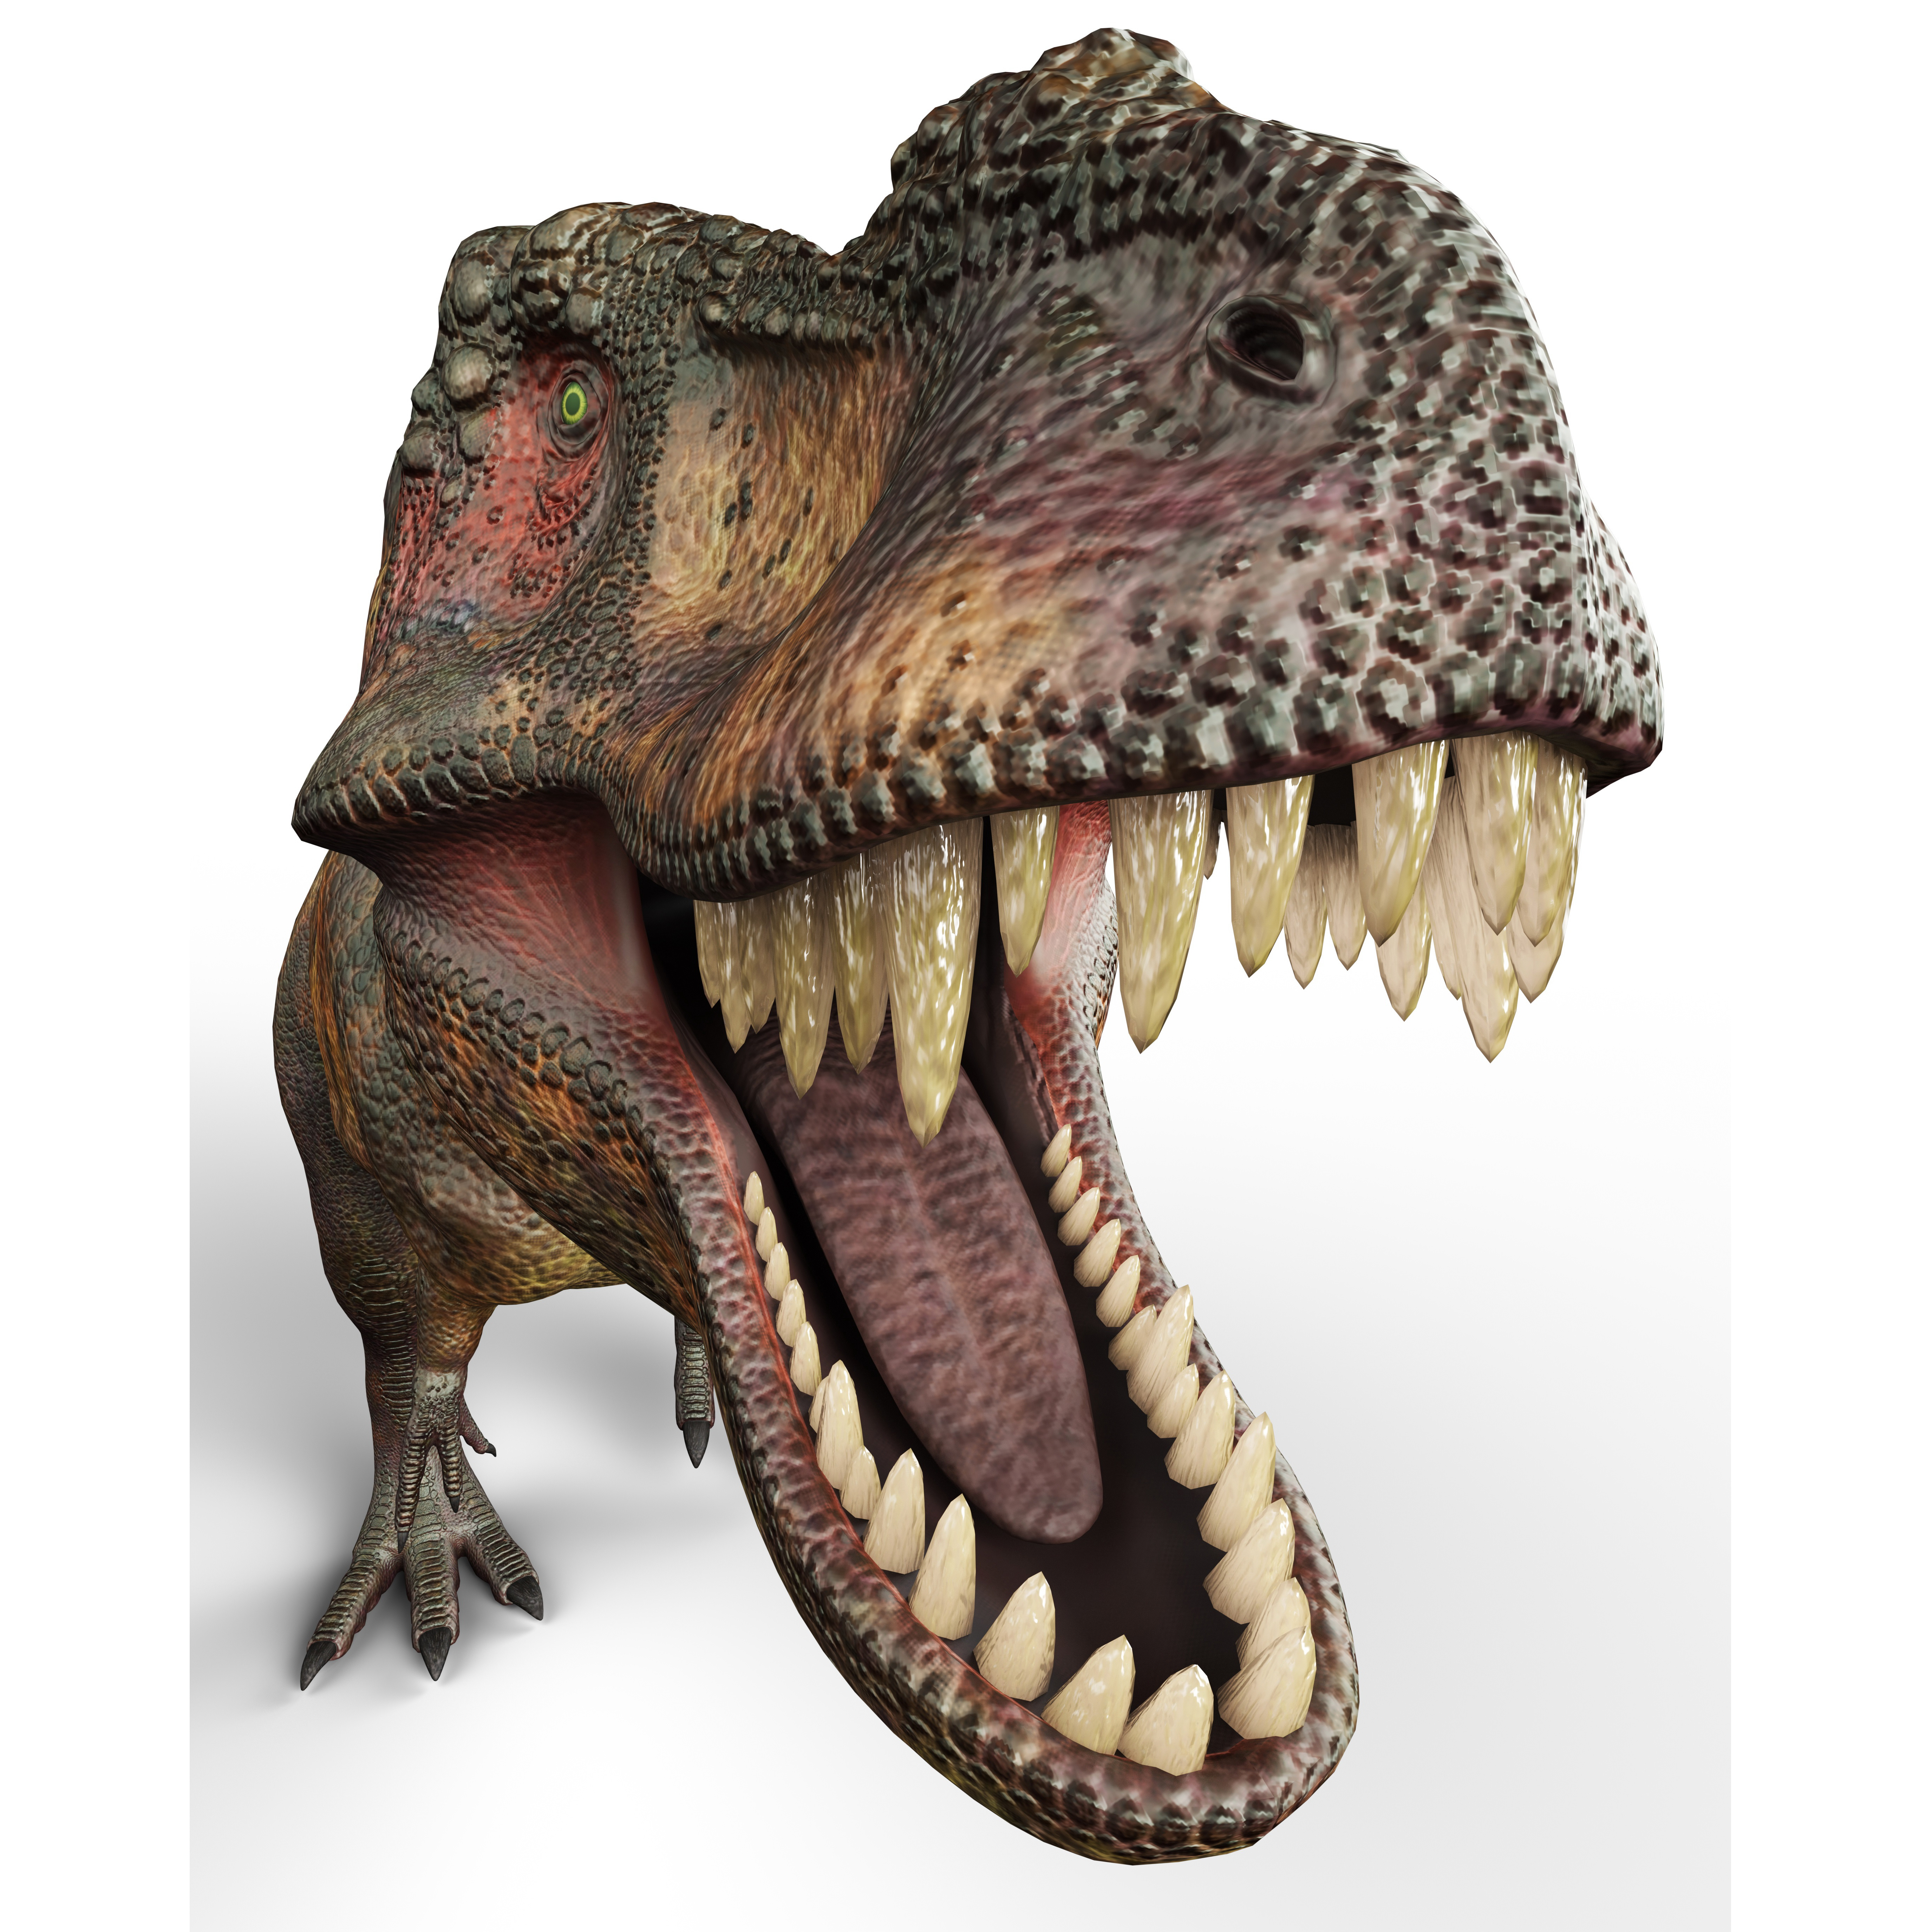 desktop wallpapers tyrannosaurus rex dinosaurs 3d graphics